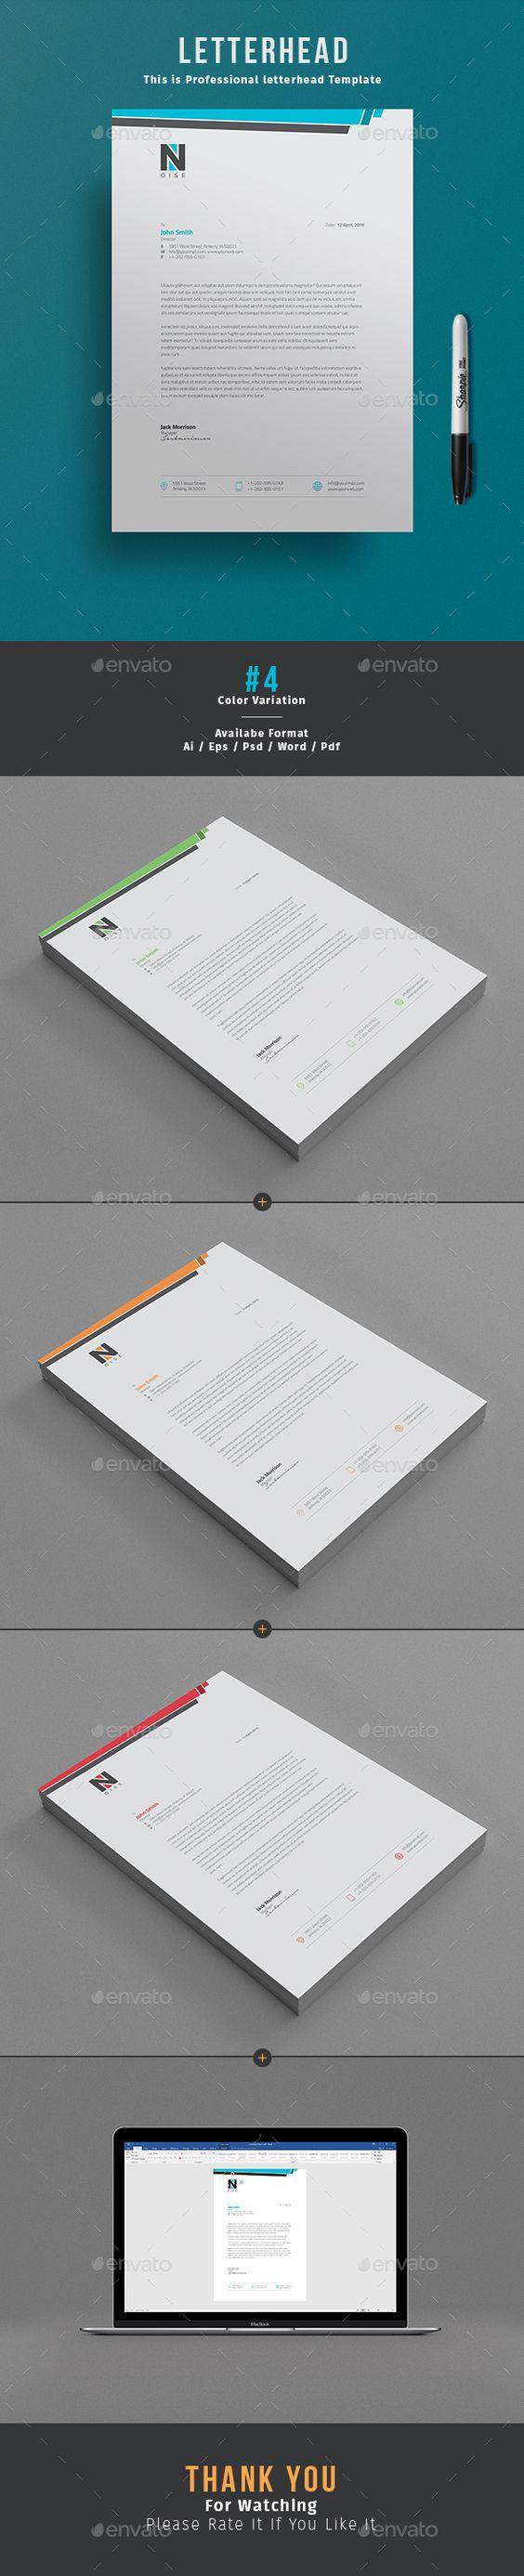 #Letterhead Design is awesome letterhead Template for company letterhead design…